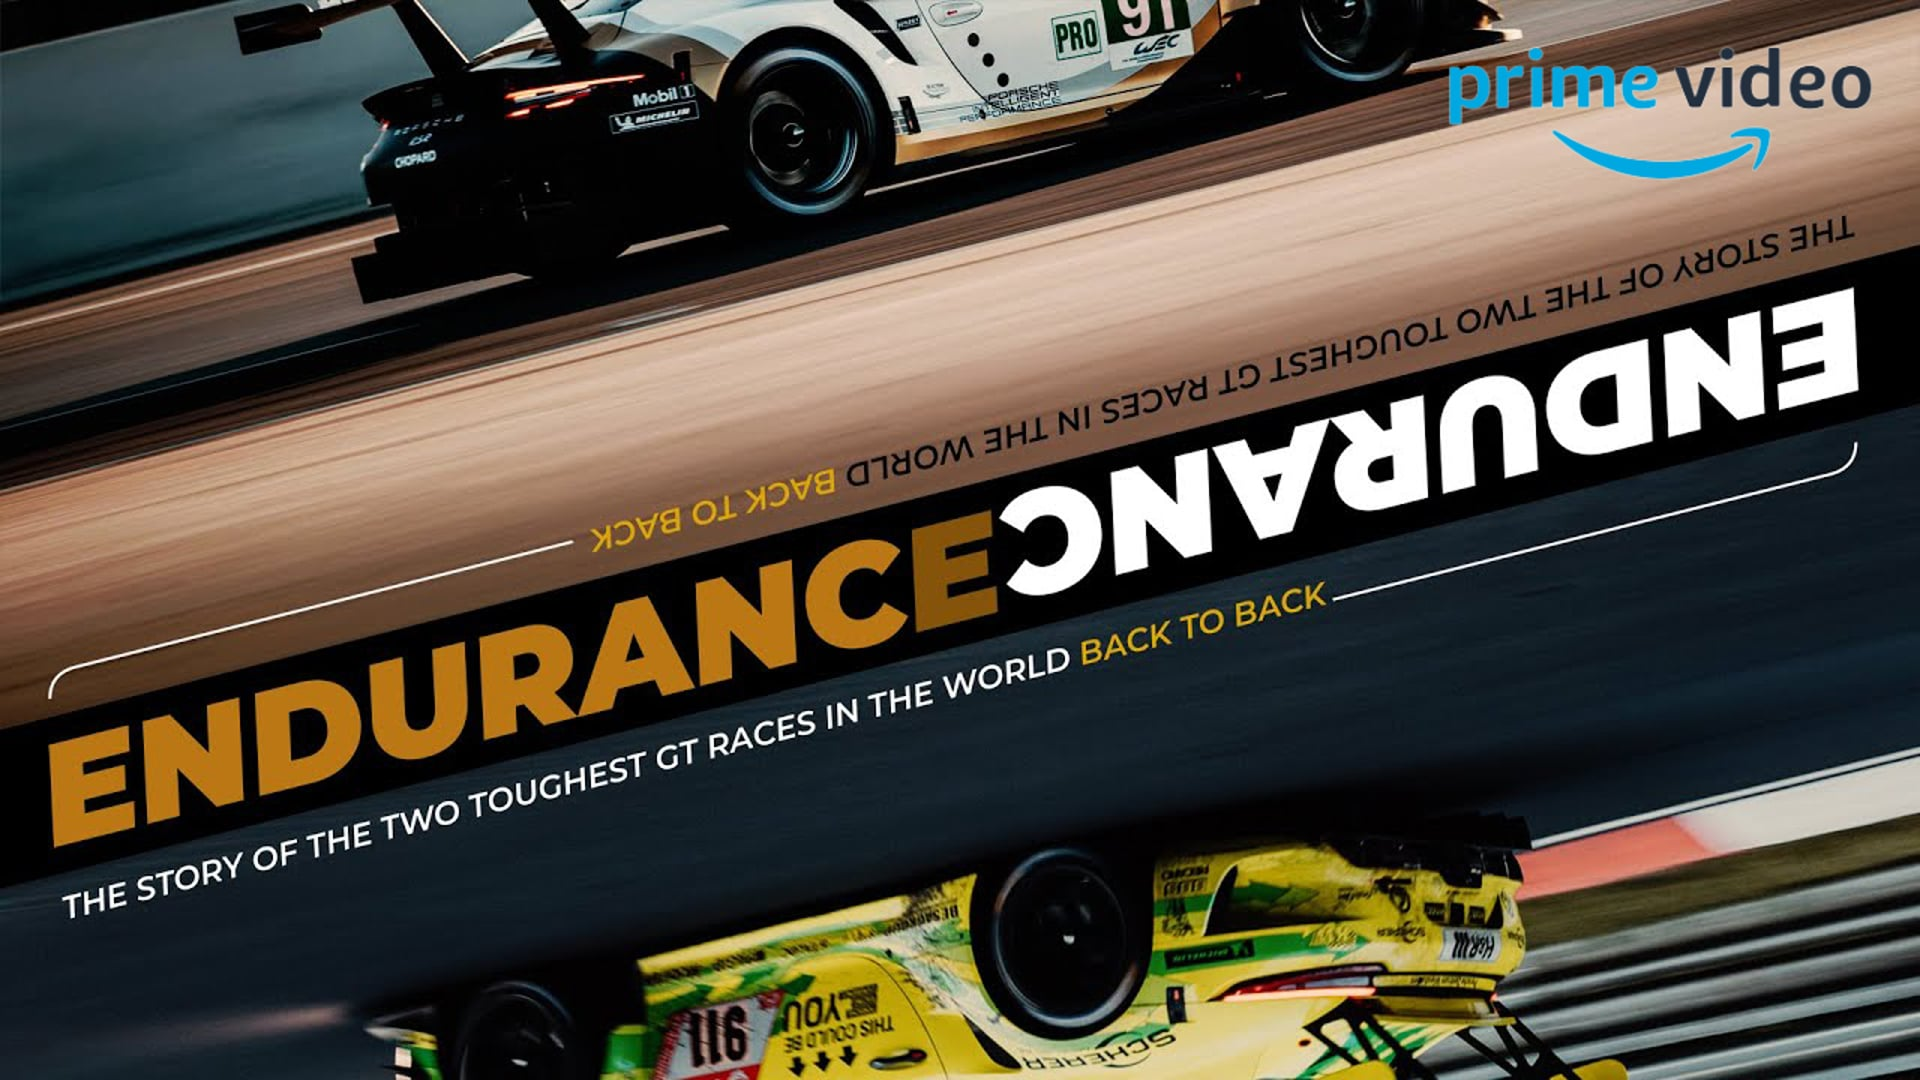 Endurance Trailer